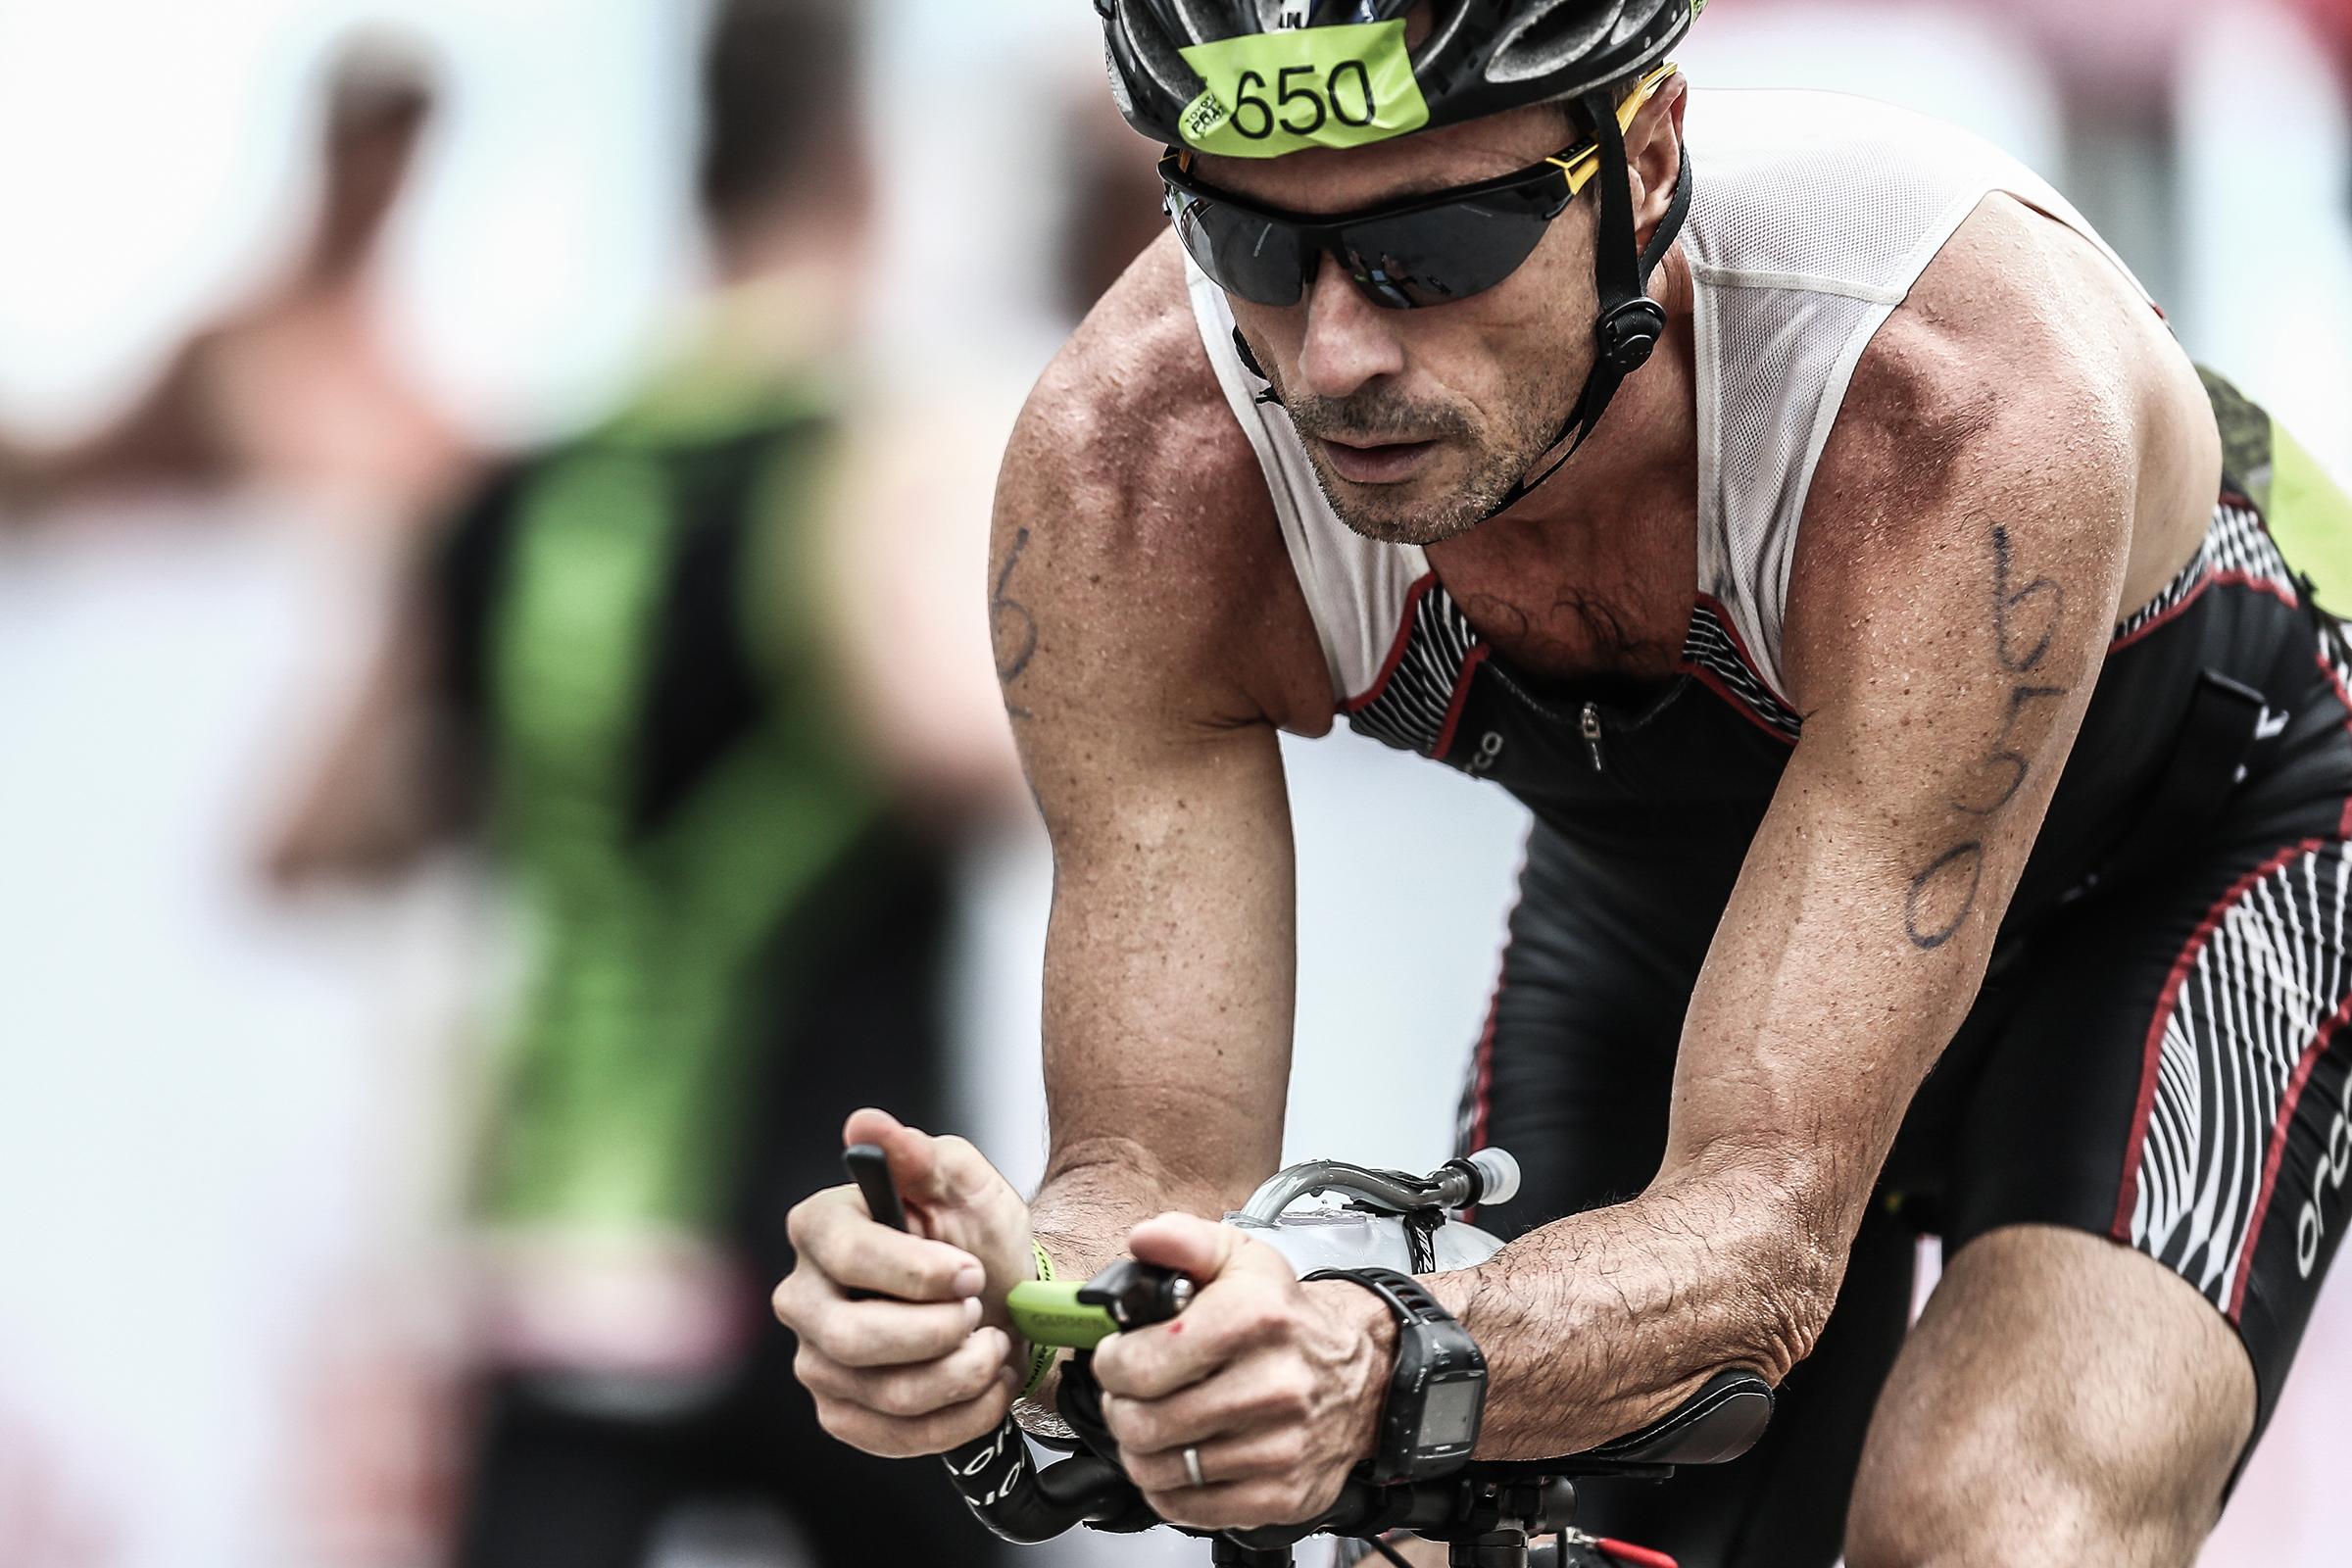 CYCLIST TRIATHLON RACE